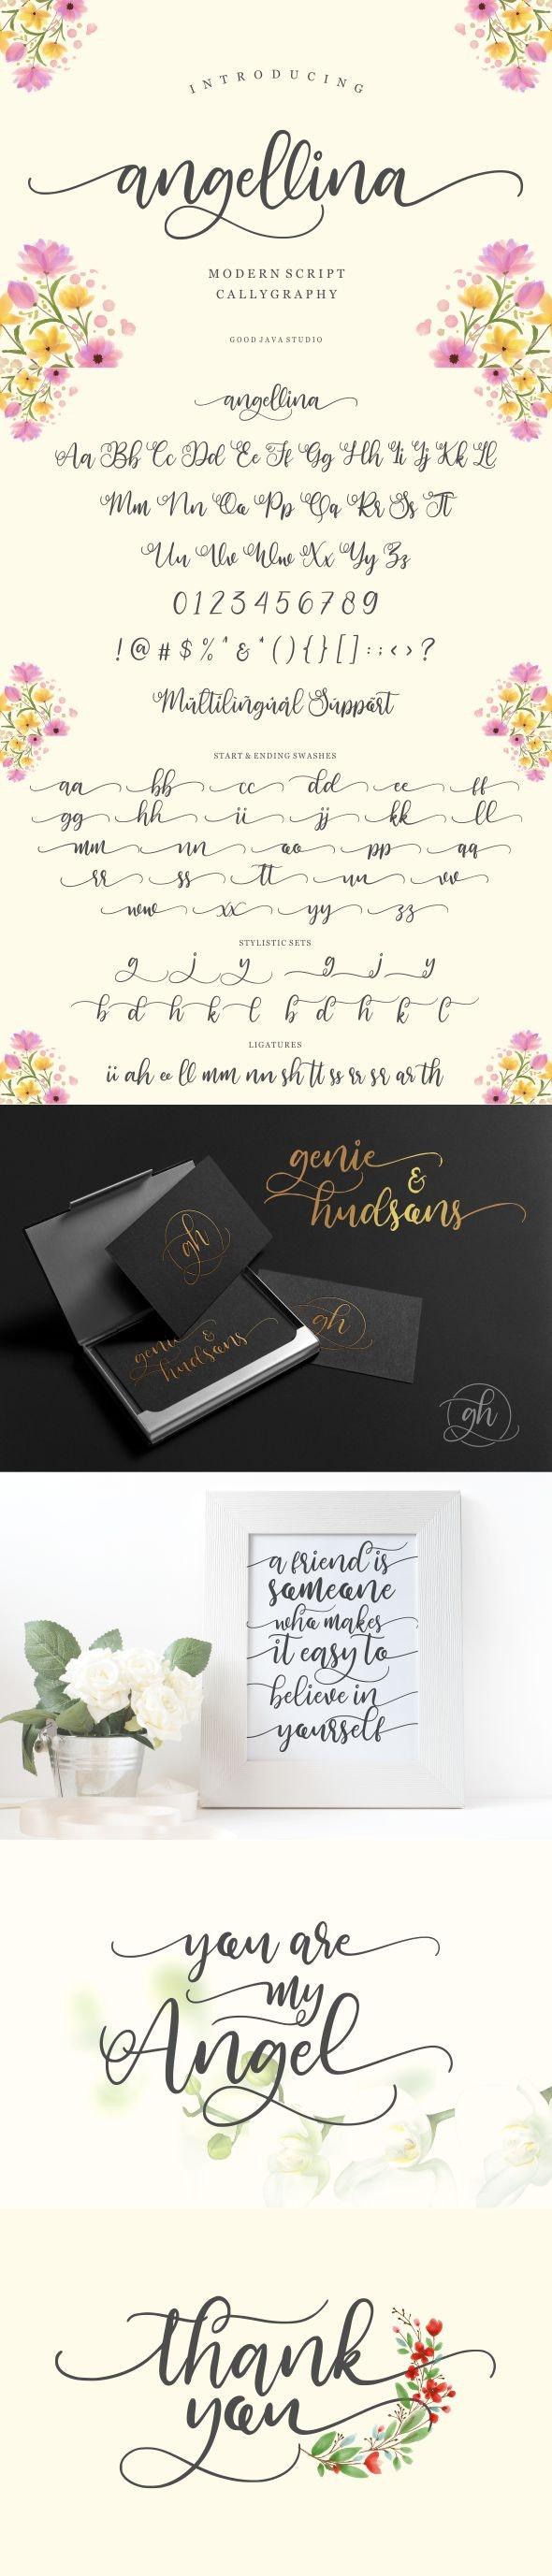 Angellina - Calligraphy Script